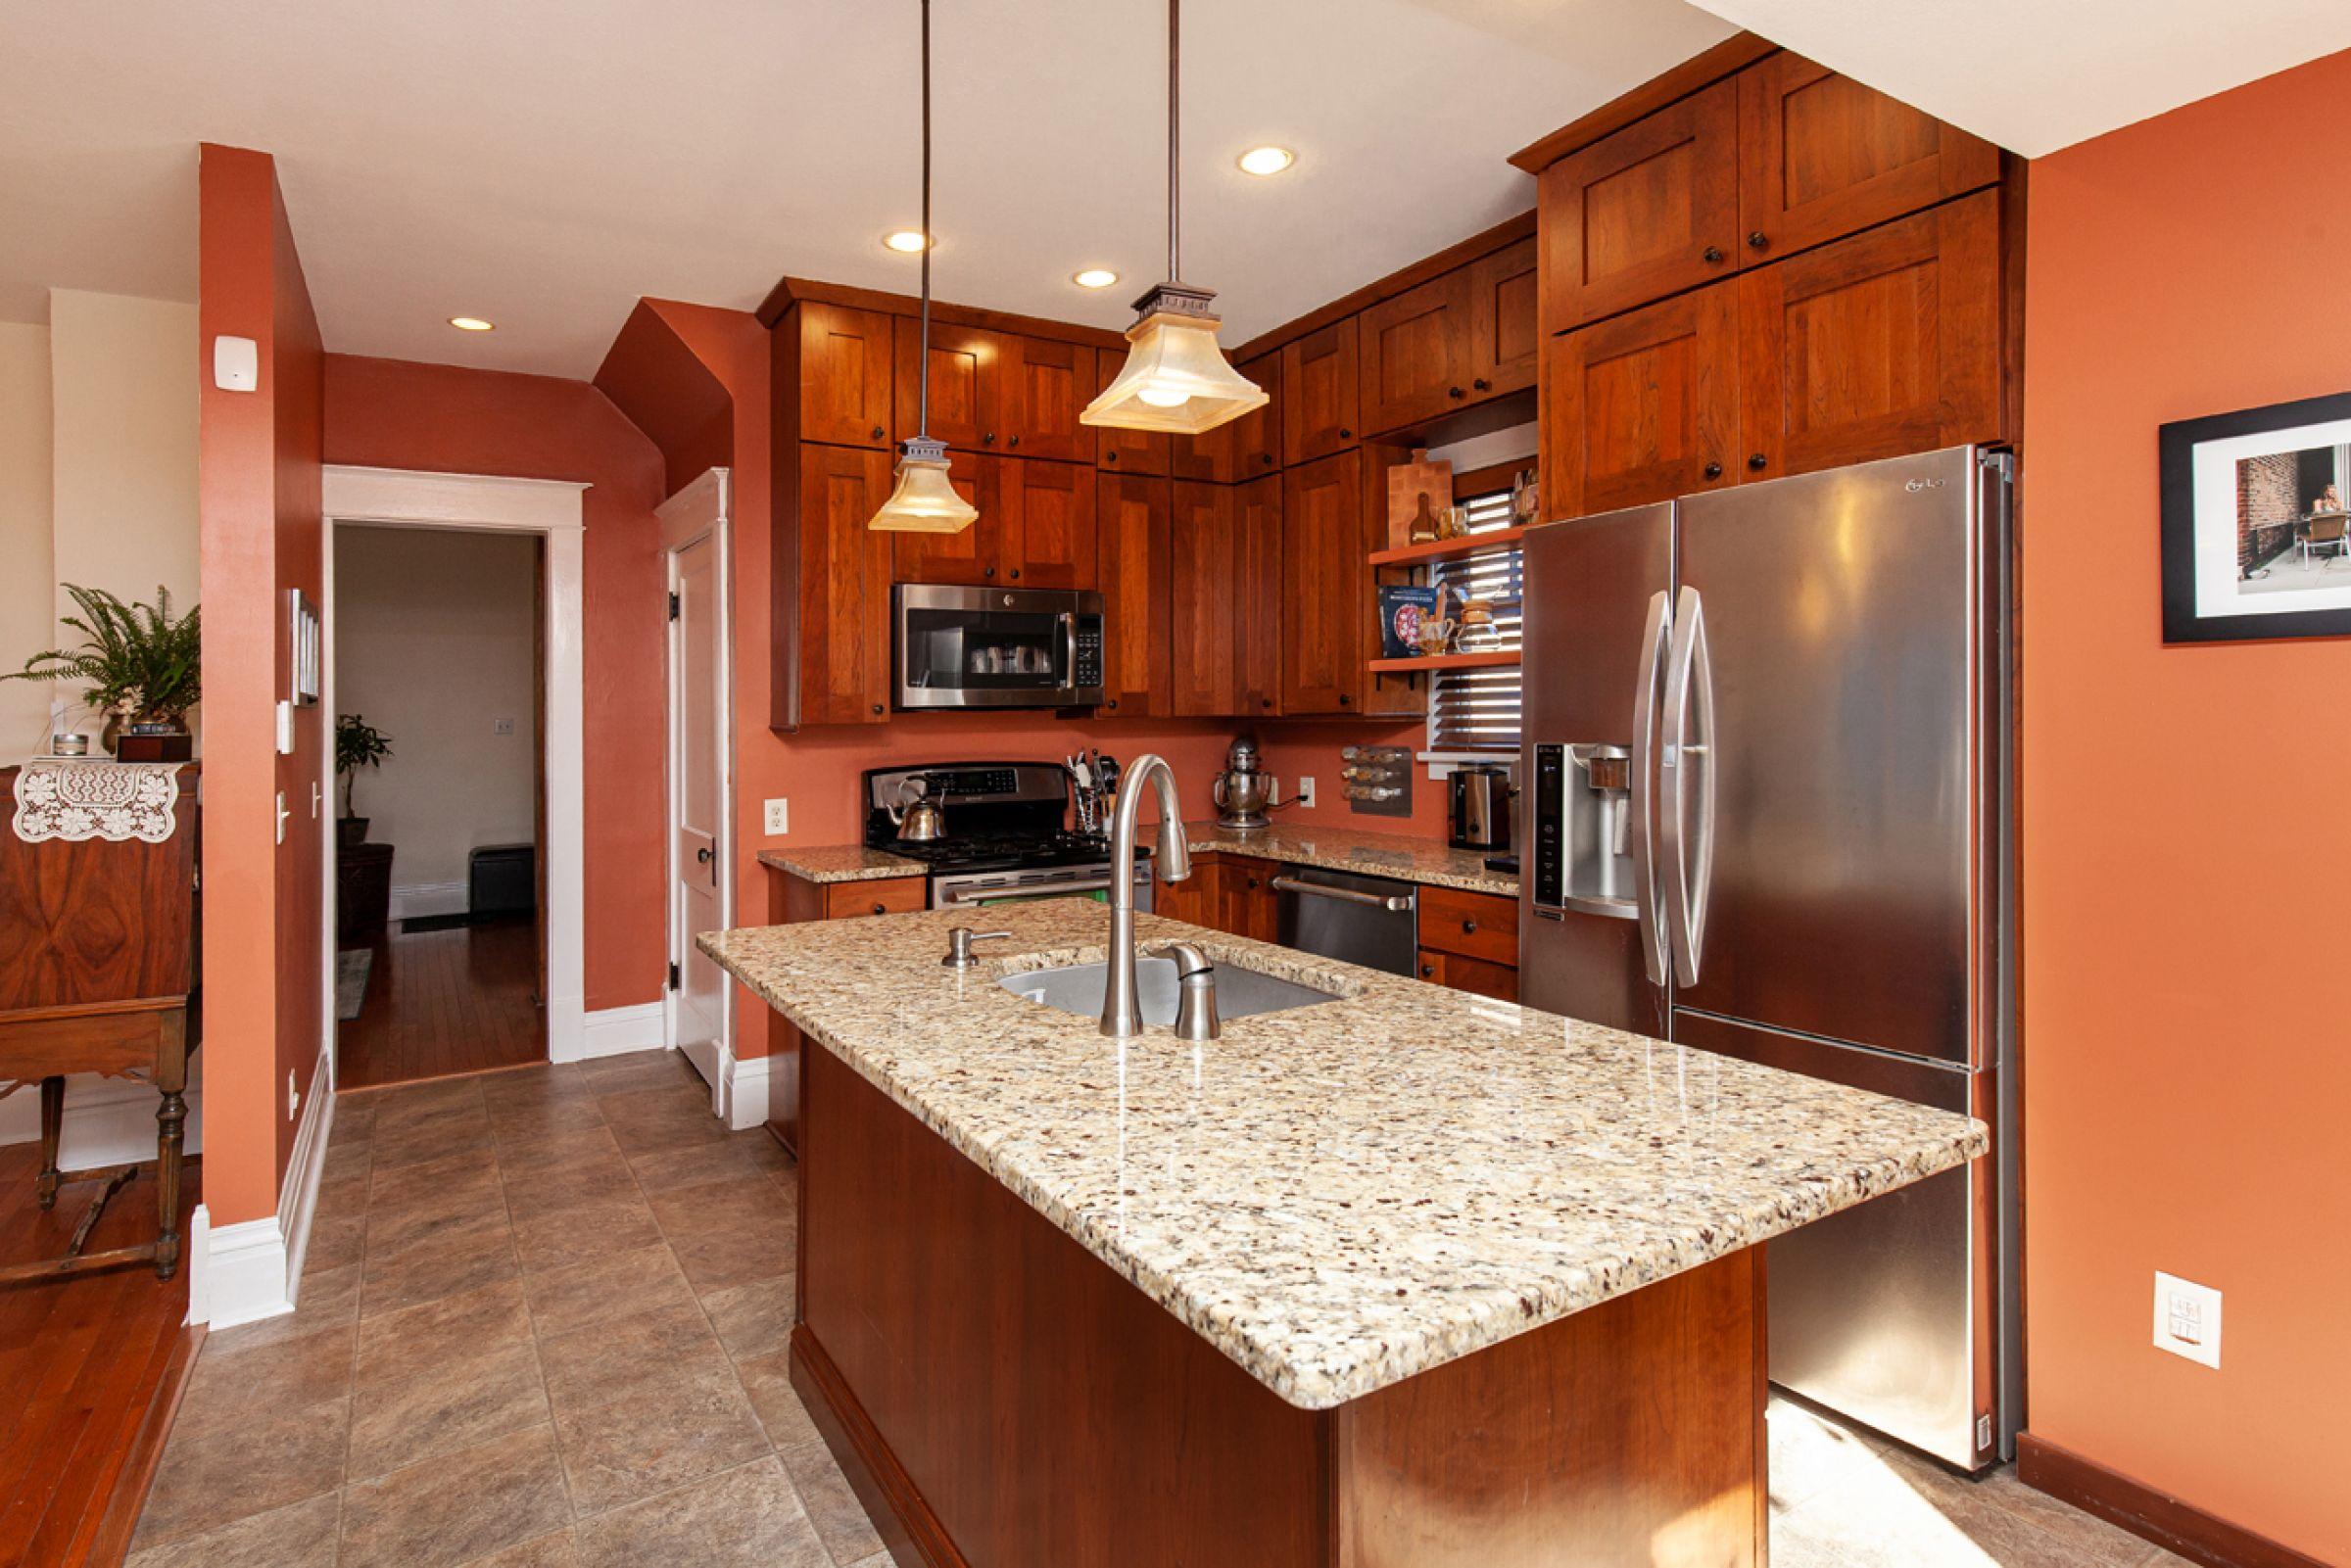 residential-polk-county-iowa-0-acres-listing-number-15153-4-2020-09-02-232110.jpg